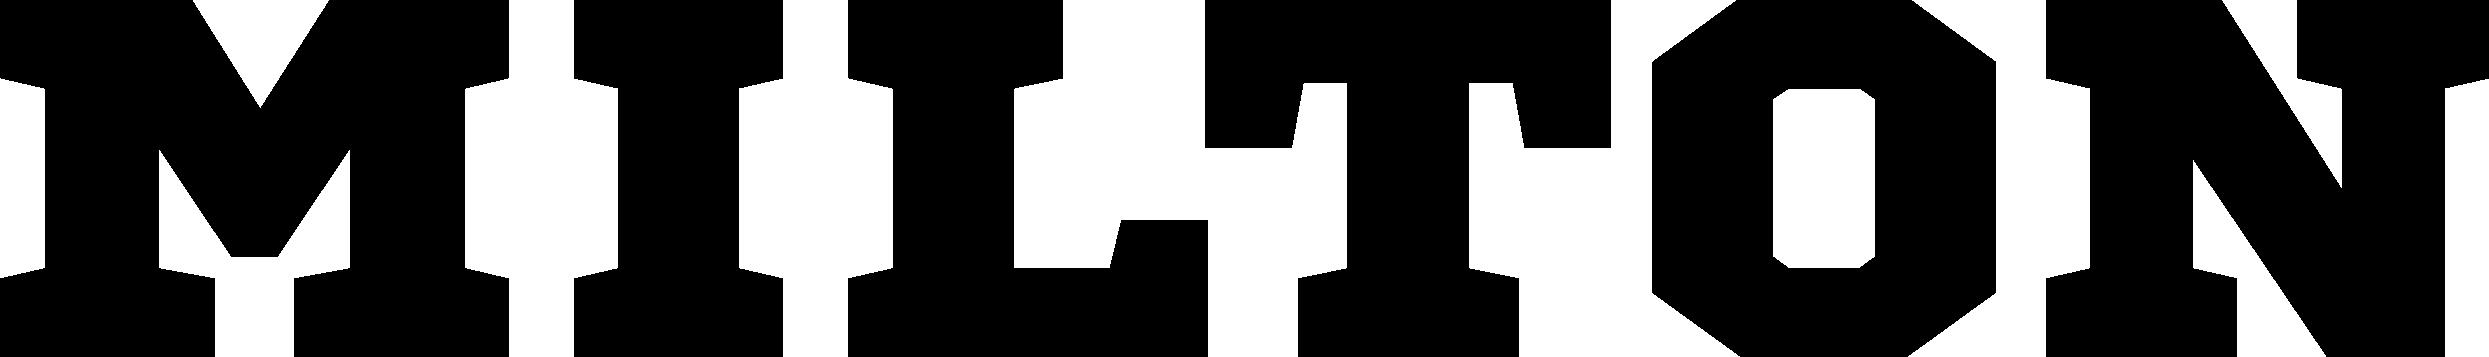 miltonsoccer